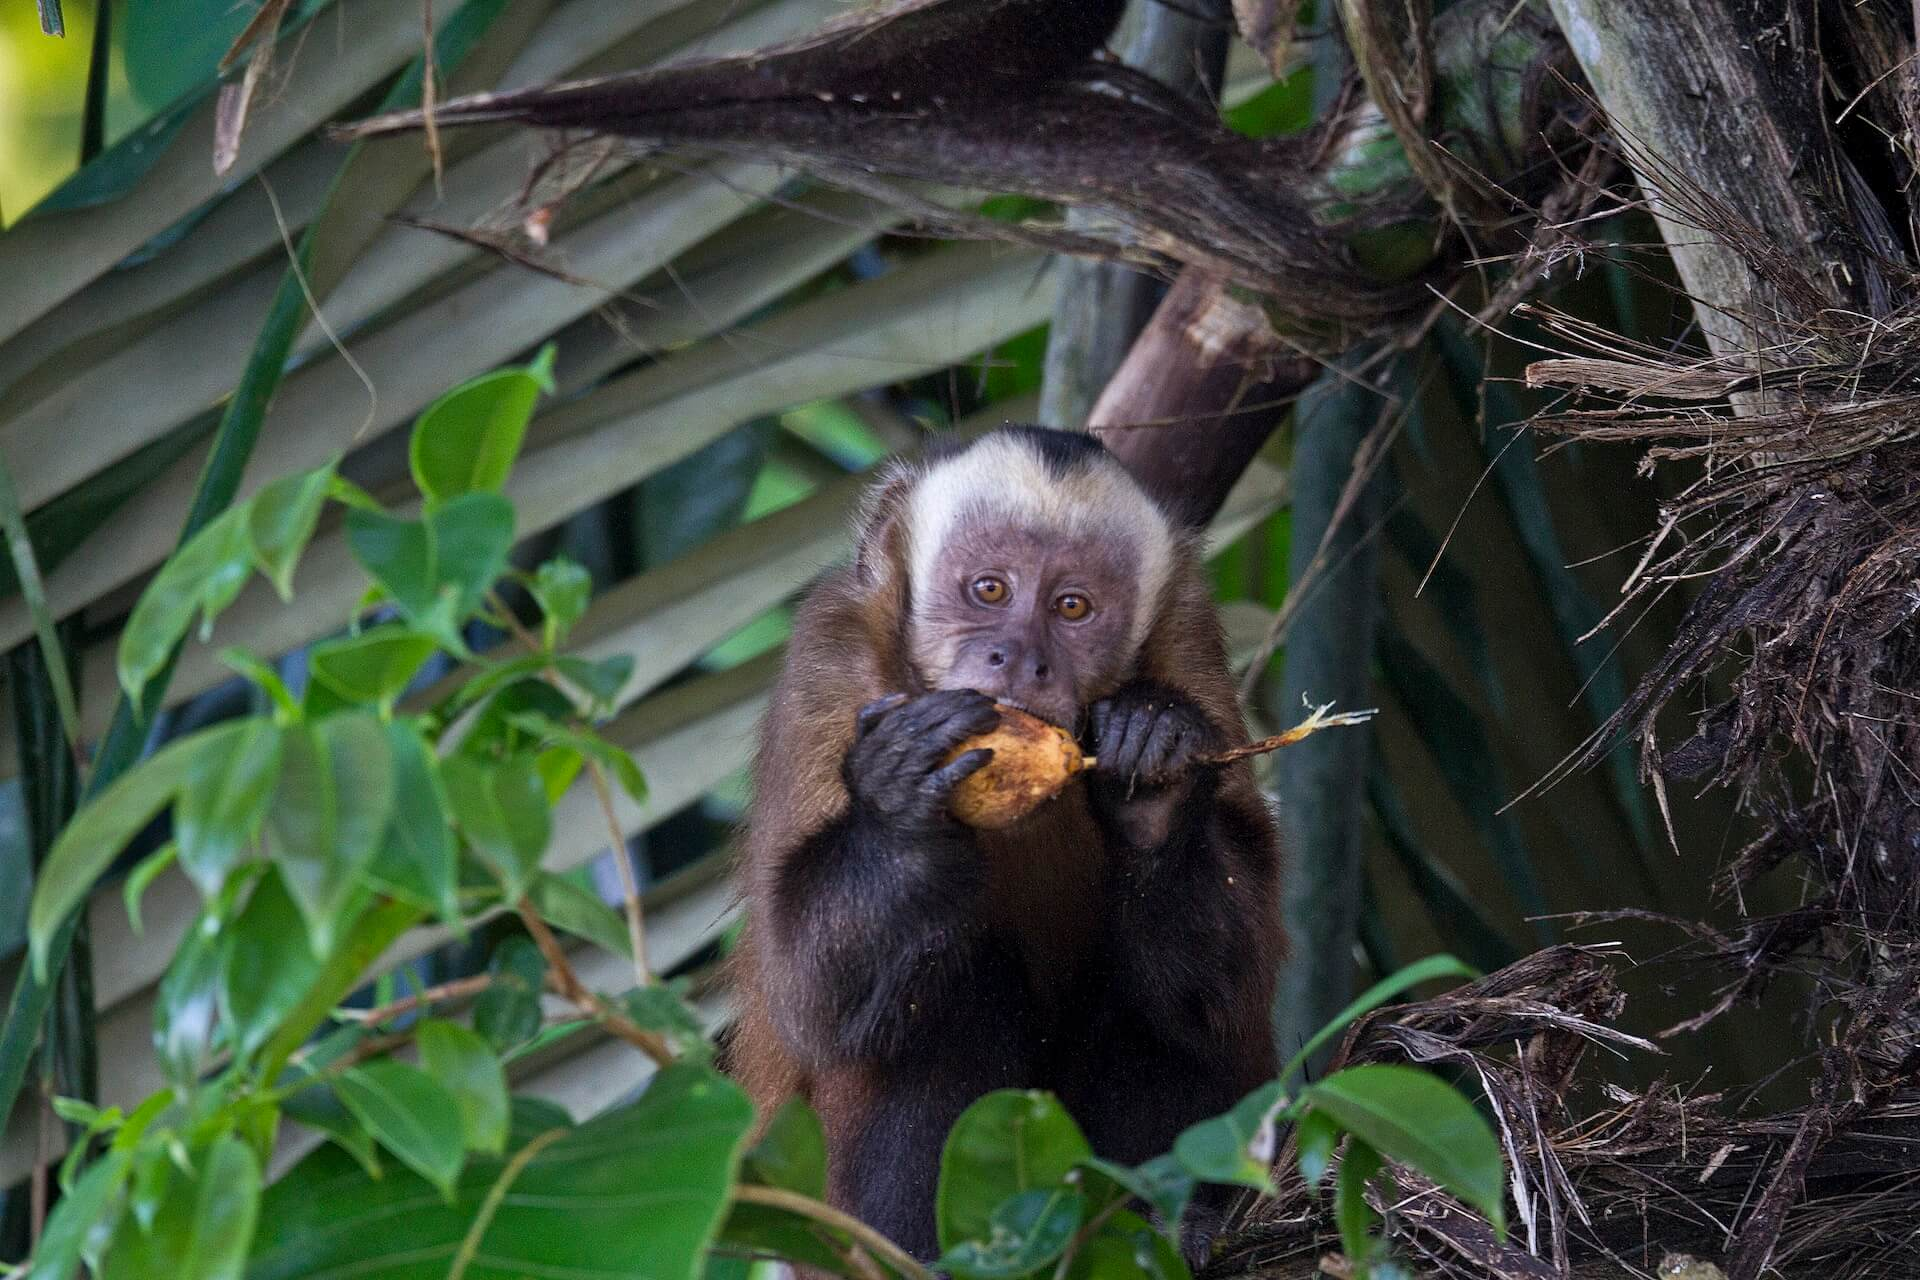 Capuchin Monkey in Peruvian Rainforest near Puerto Maldonado